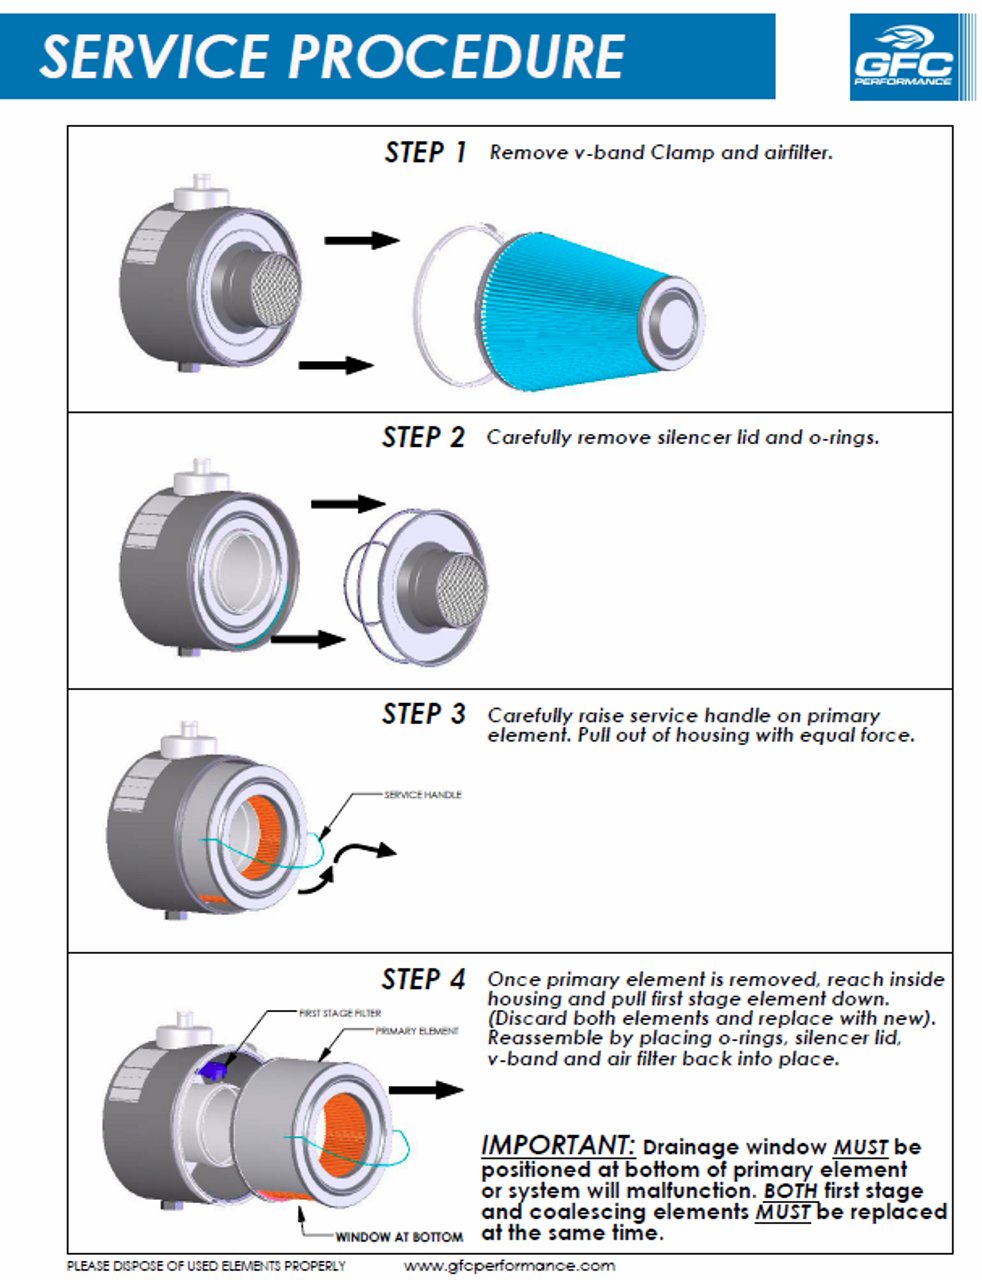 Service Procedure GFC A9007 Air Filter GFC Coalescer Cummins QSB 411007